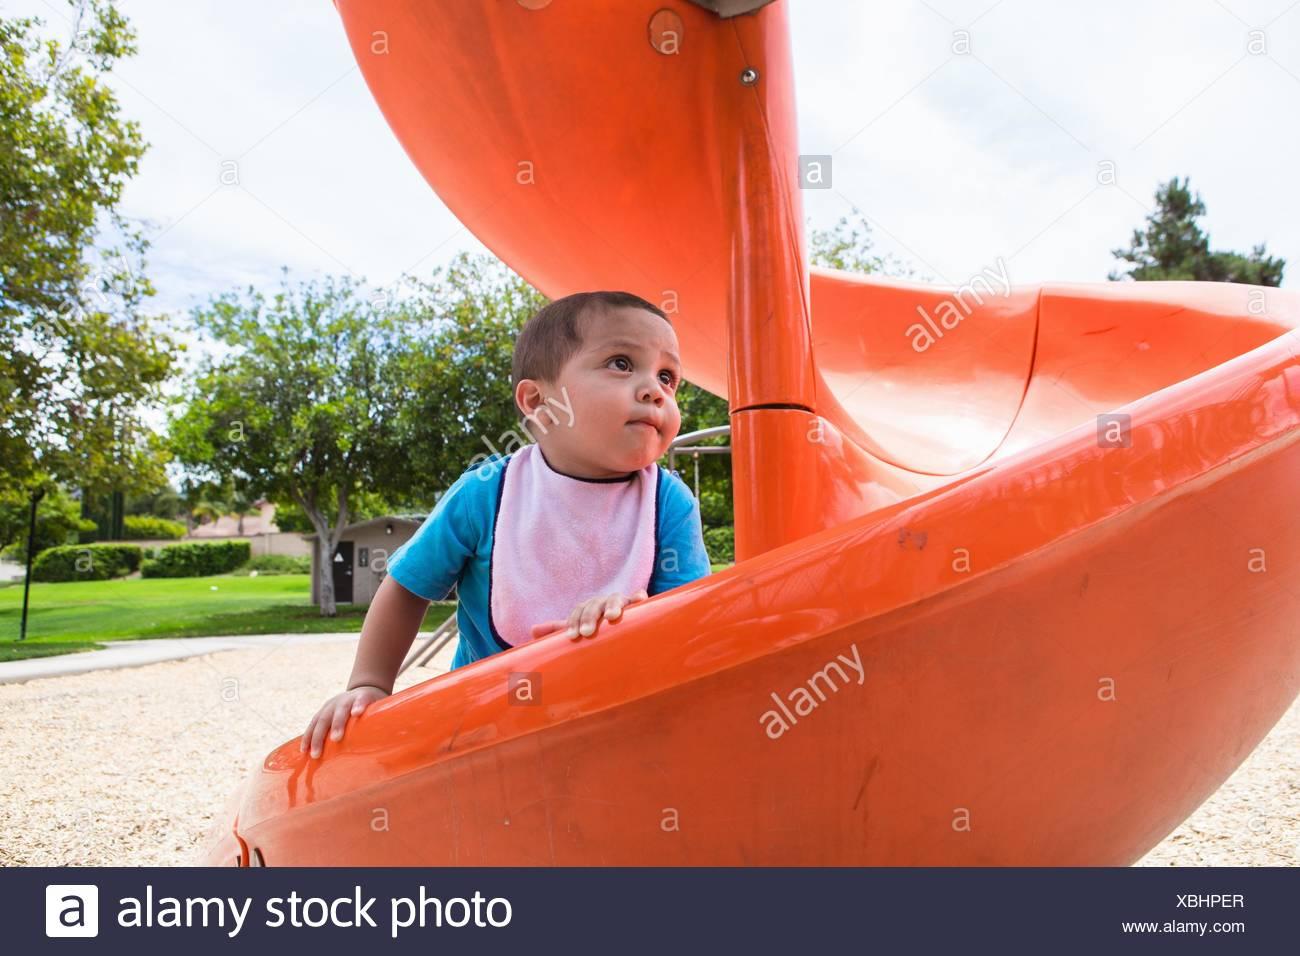 Male toddler climbing up orange playground slide - Stock Image